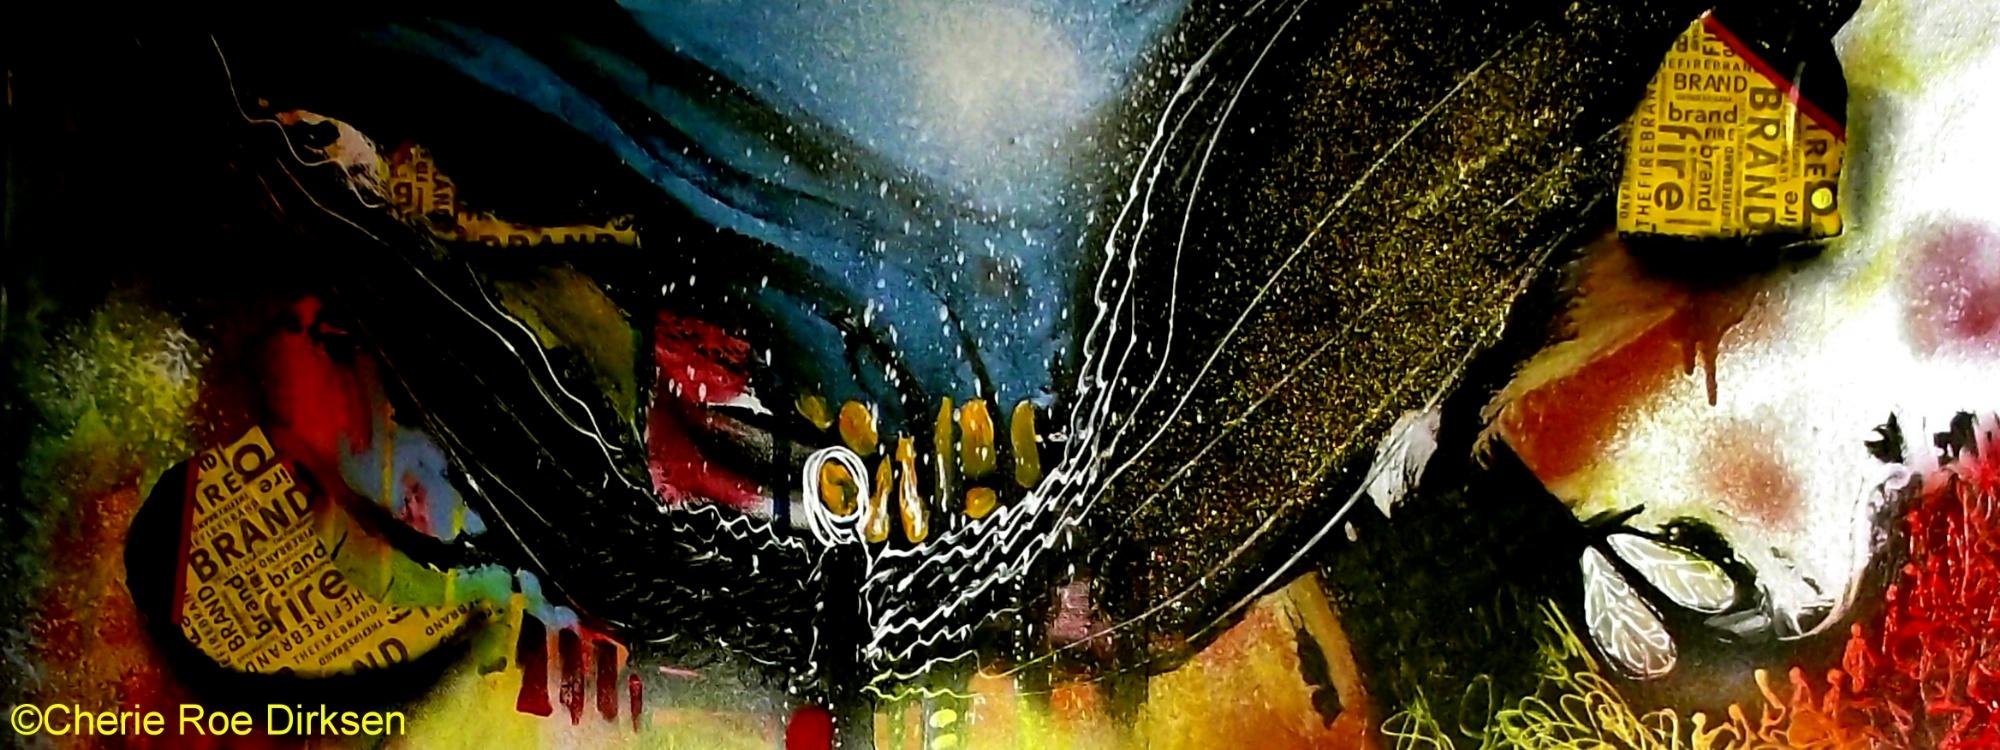 Cold Burn Nirvana by Cherie Roe Dirksen